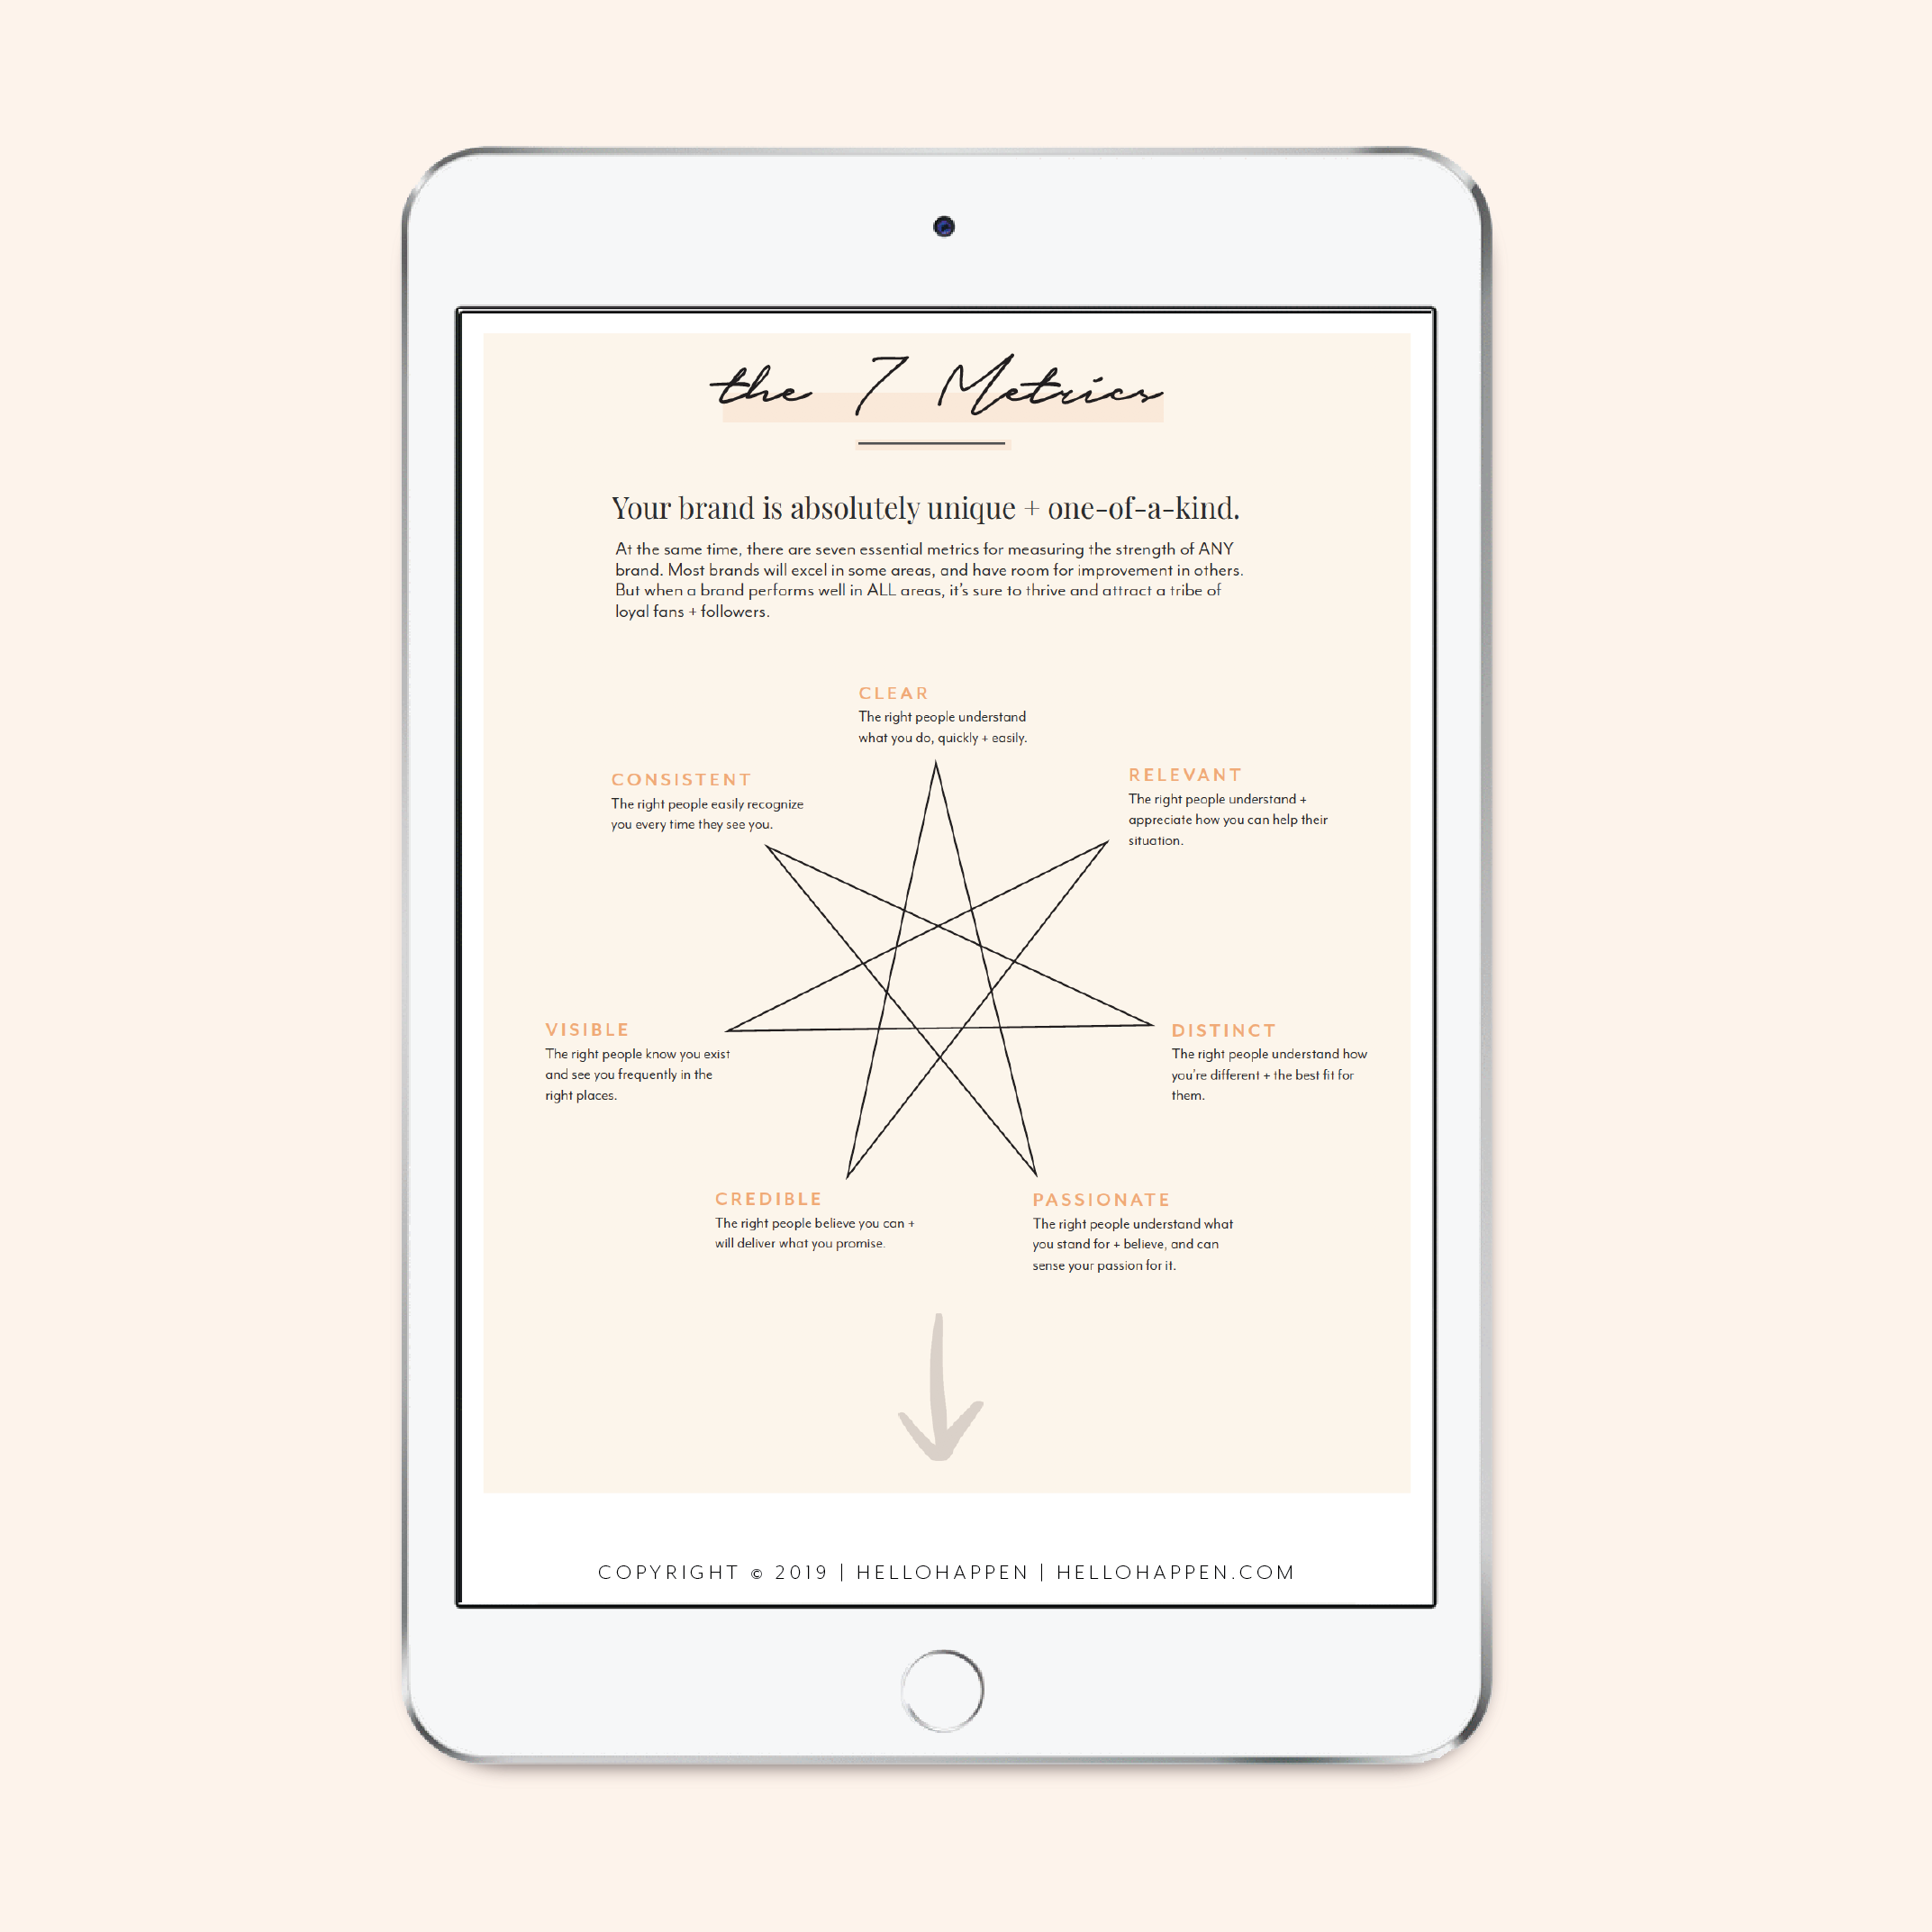 Brand blueprint 7 metrics